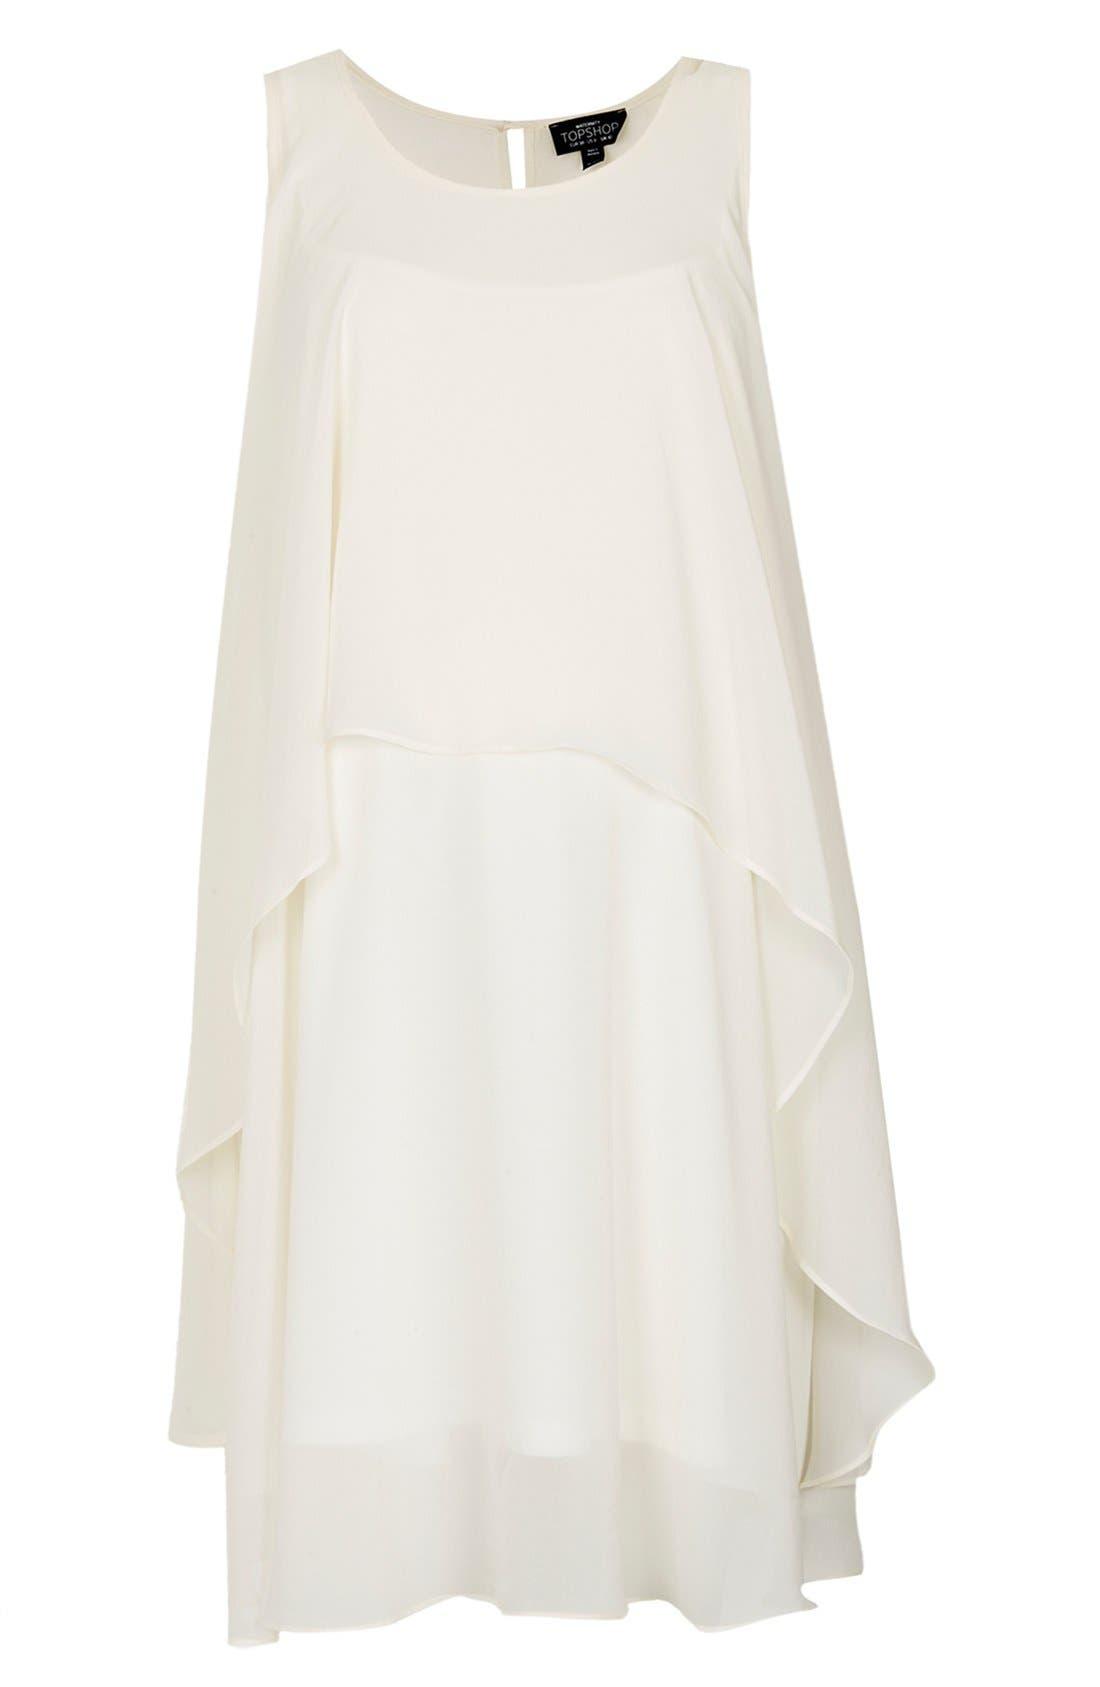 Alternate Image 1 Selected - Topshop Waterfall Trapeze Maternity Dress